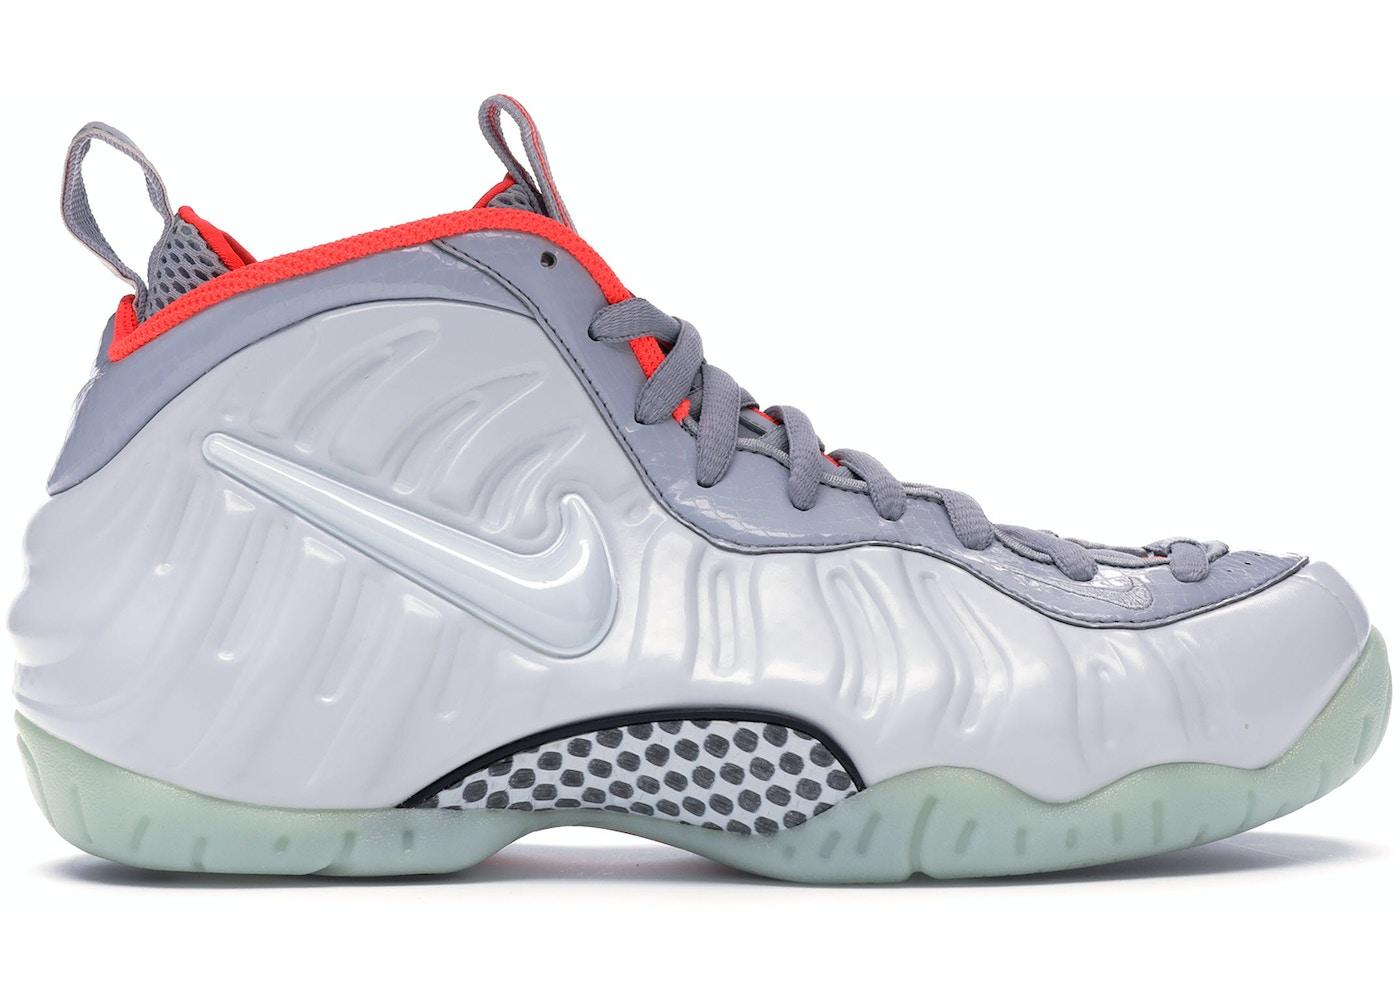 half off 846cf beb64 Buy Nike Foamposite Shoes & Deadstock Sneakers